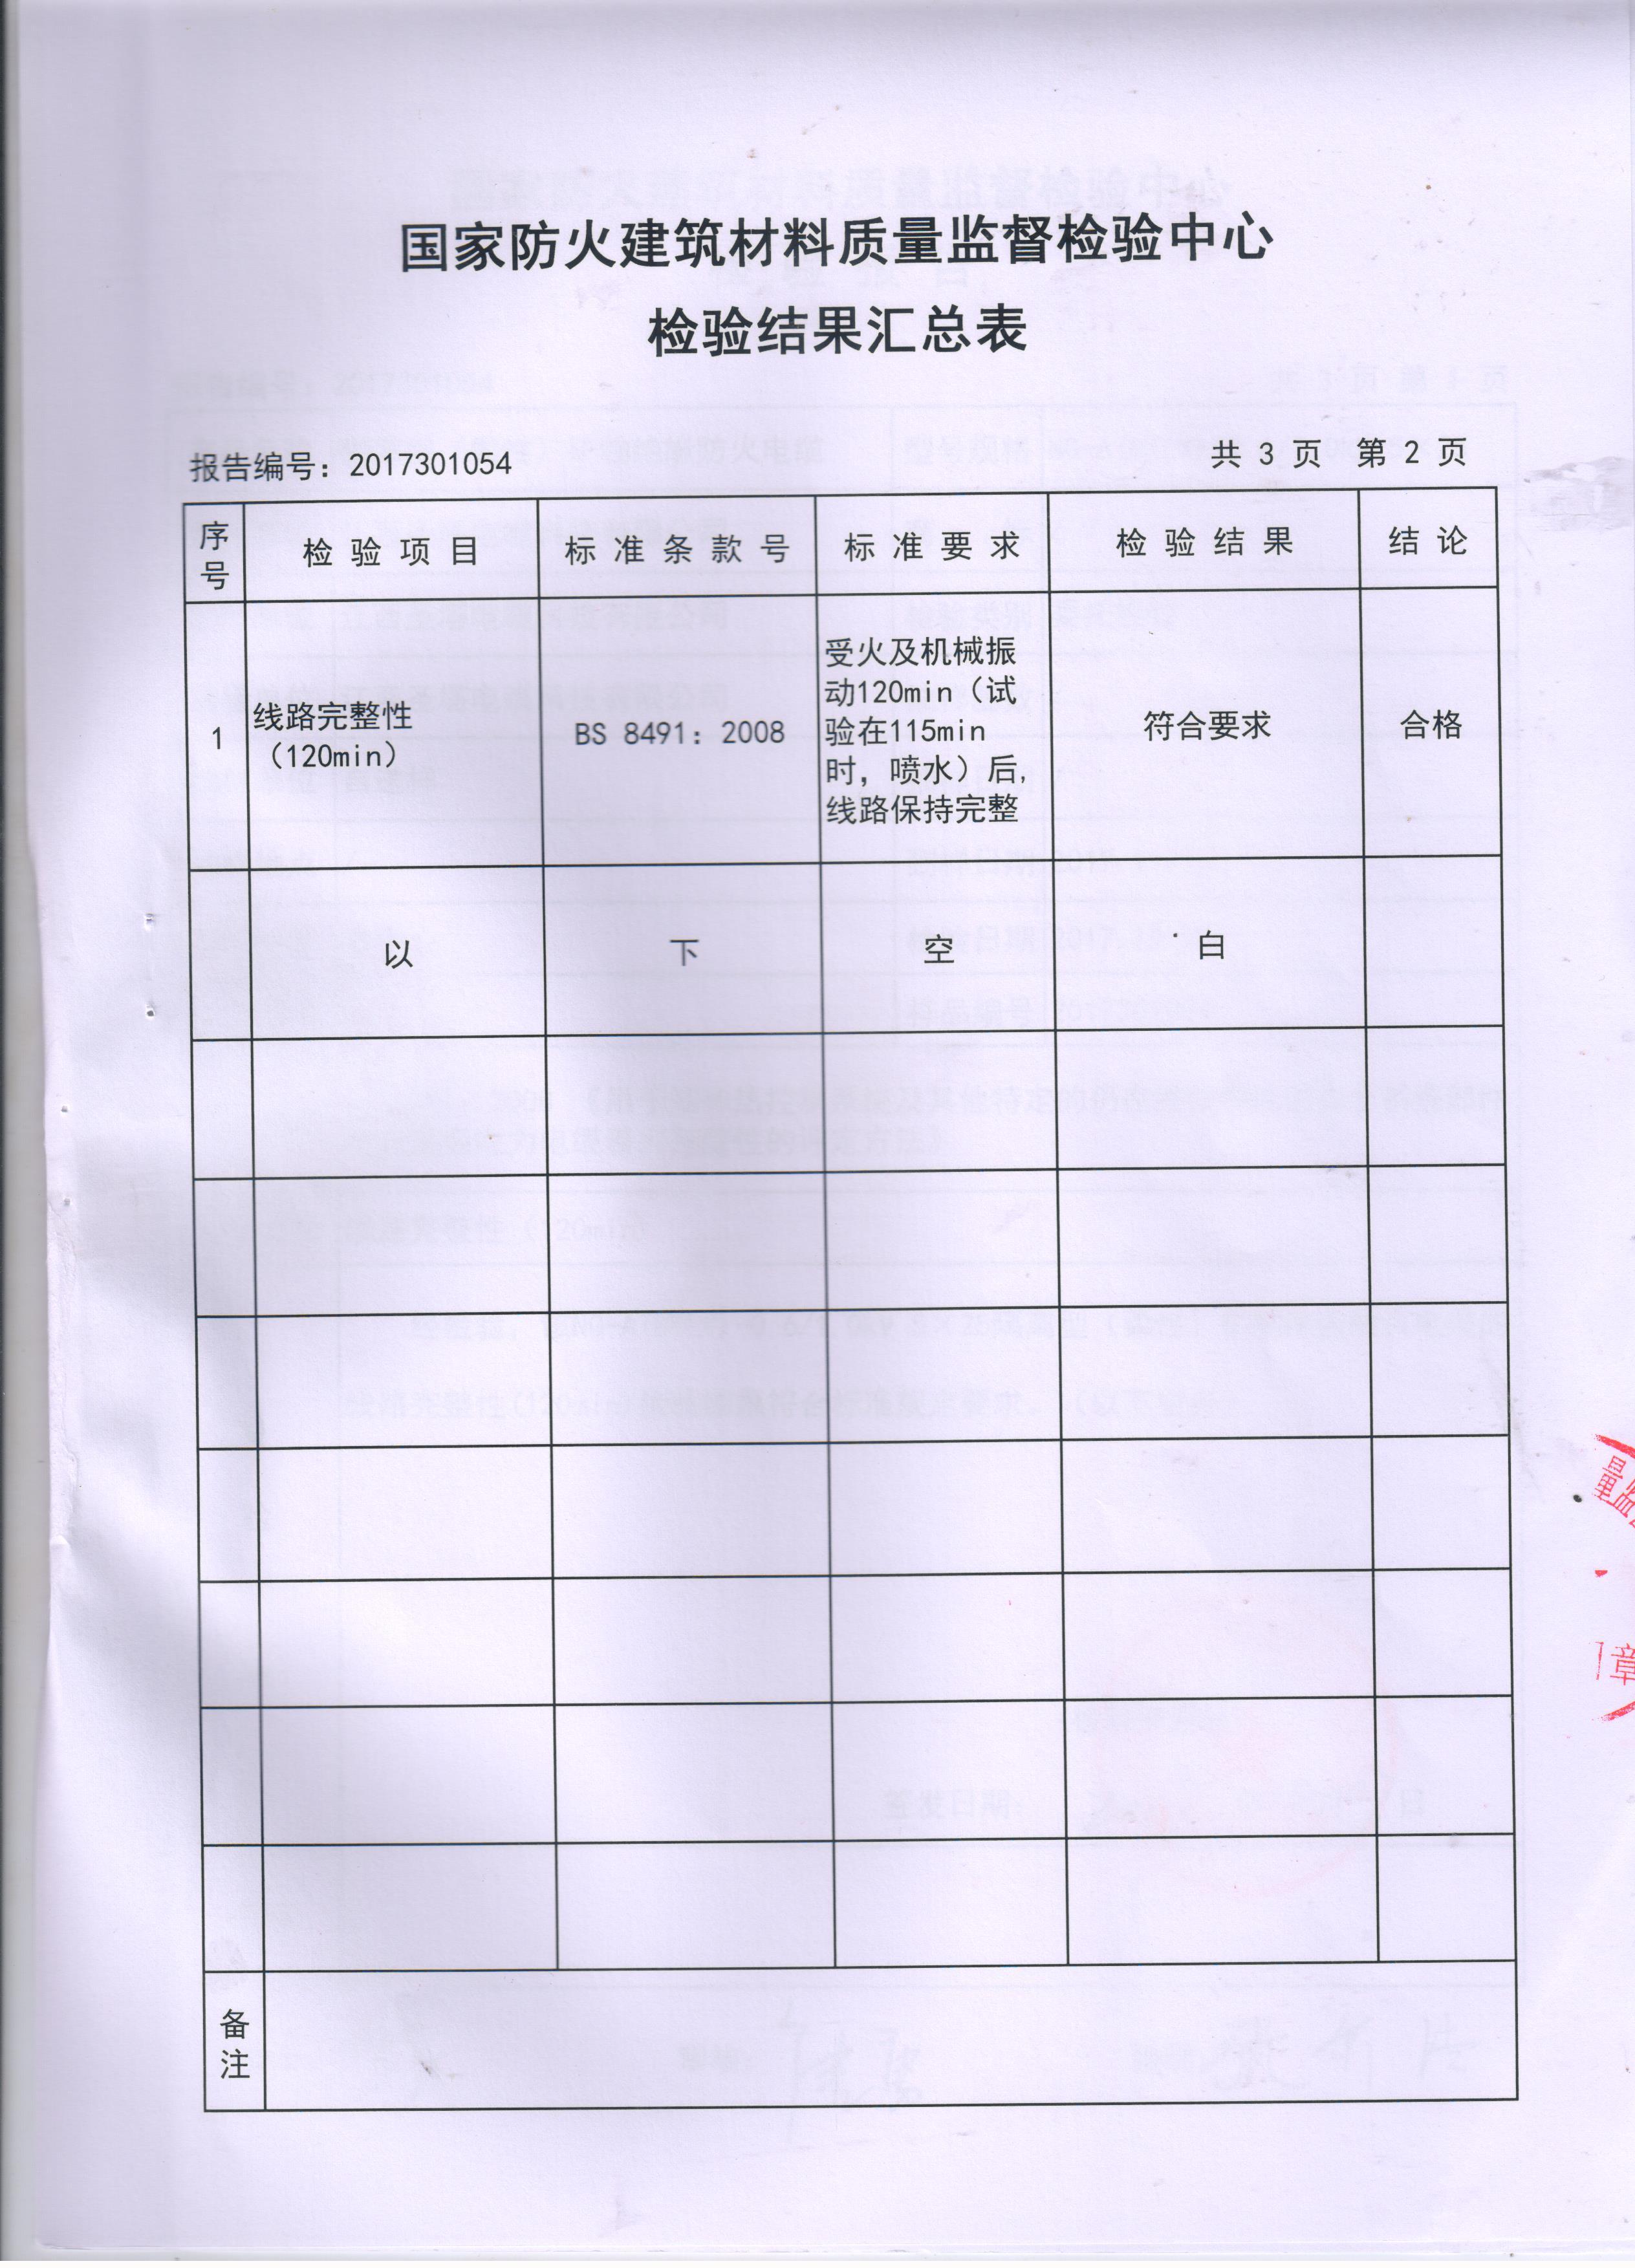 NG-A(BTLY)检测报告3 001.jpg